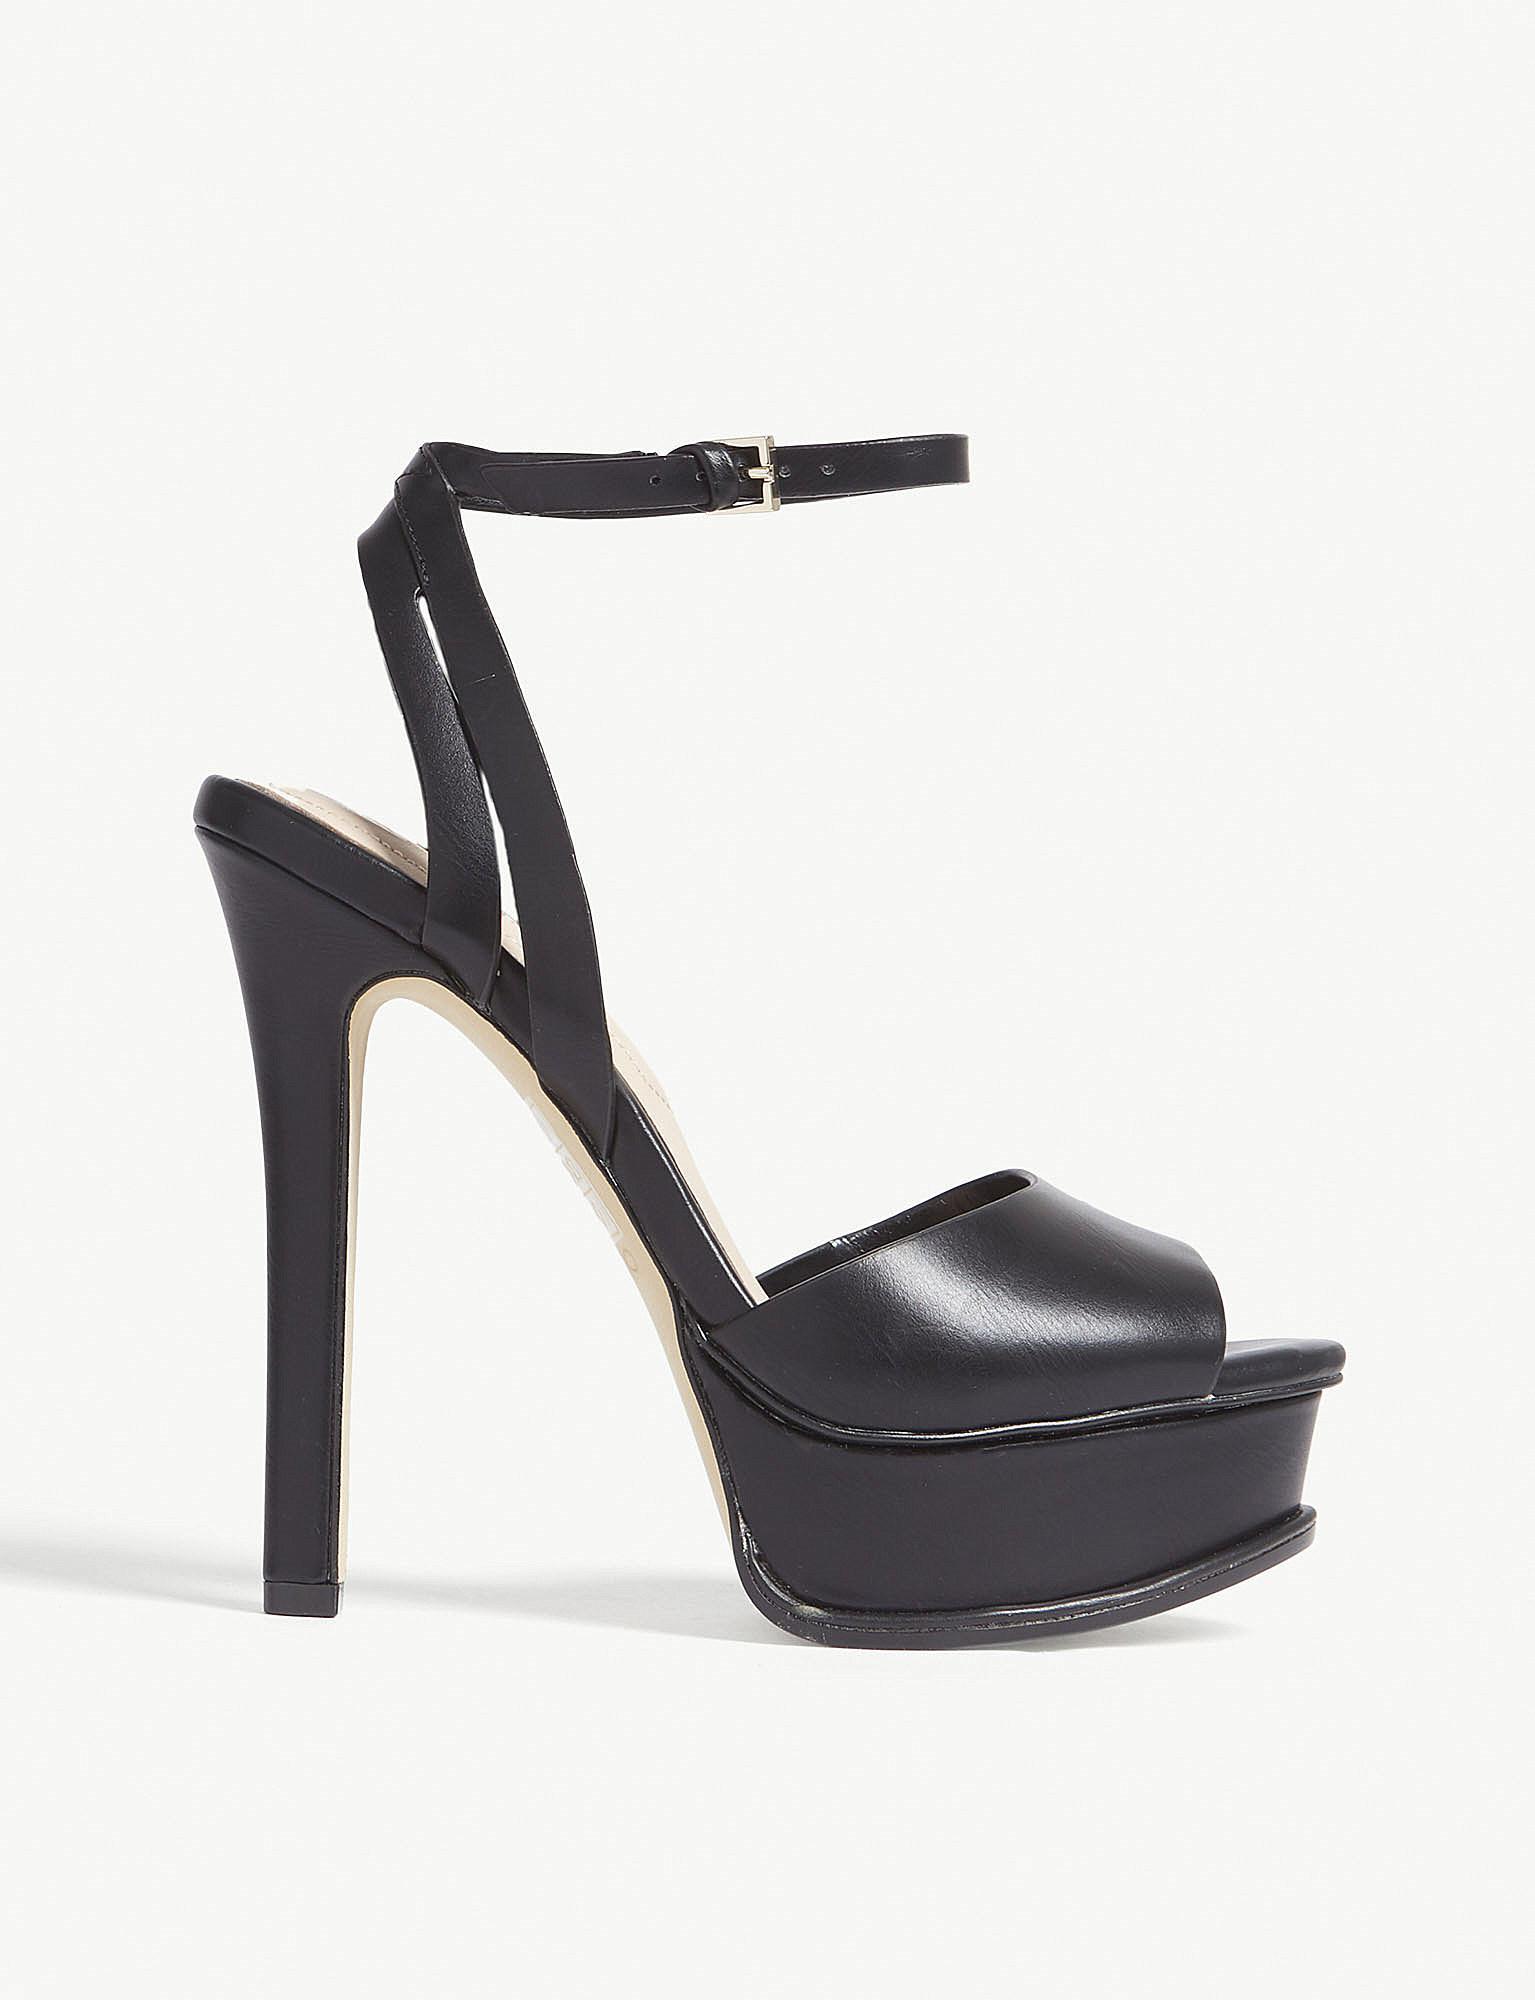 48b82fab80e5 Lyst - ALDO Eowelassa High Ankle Strap Sandals in Black